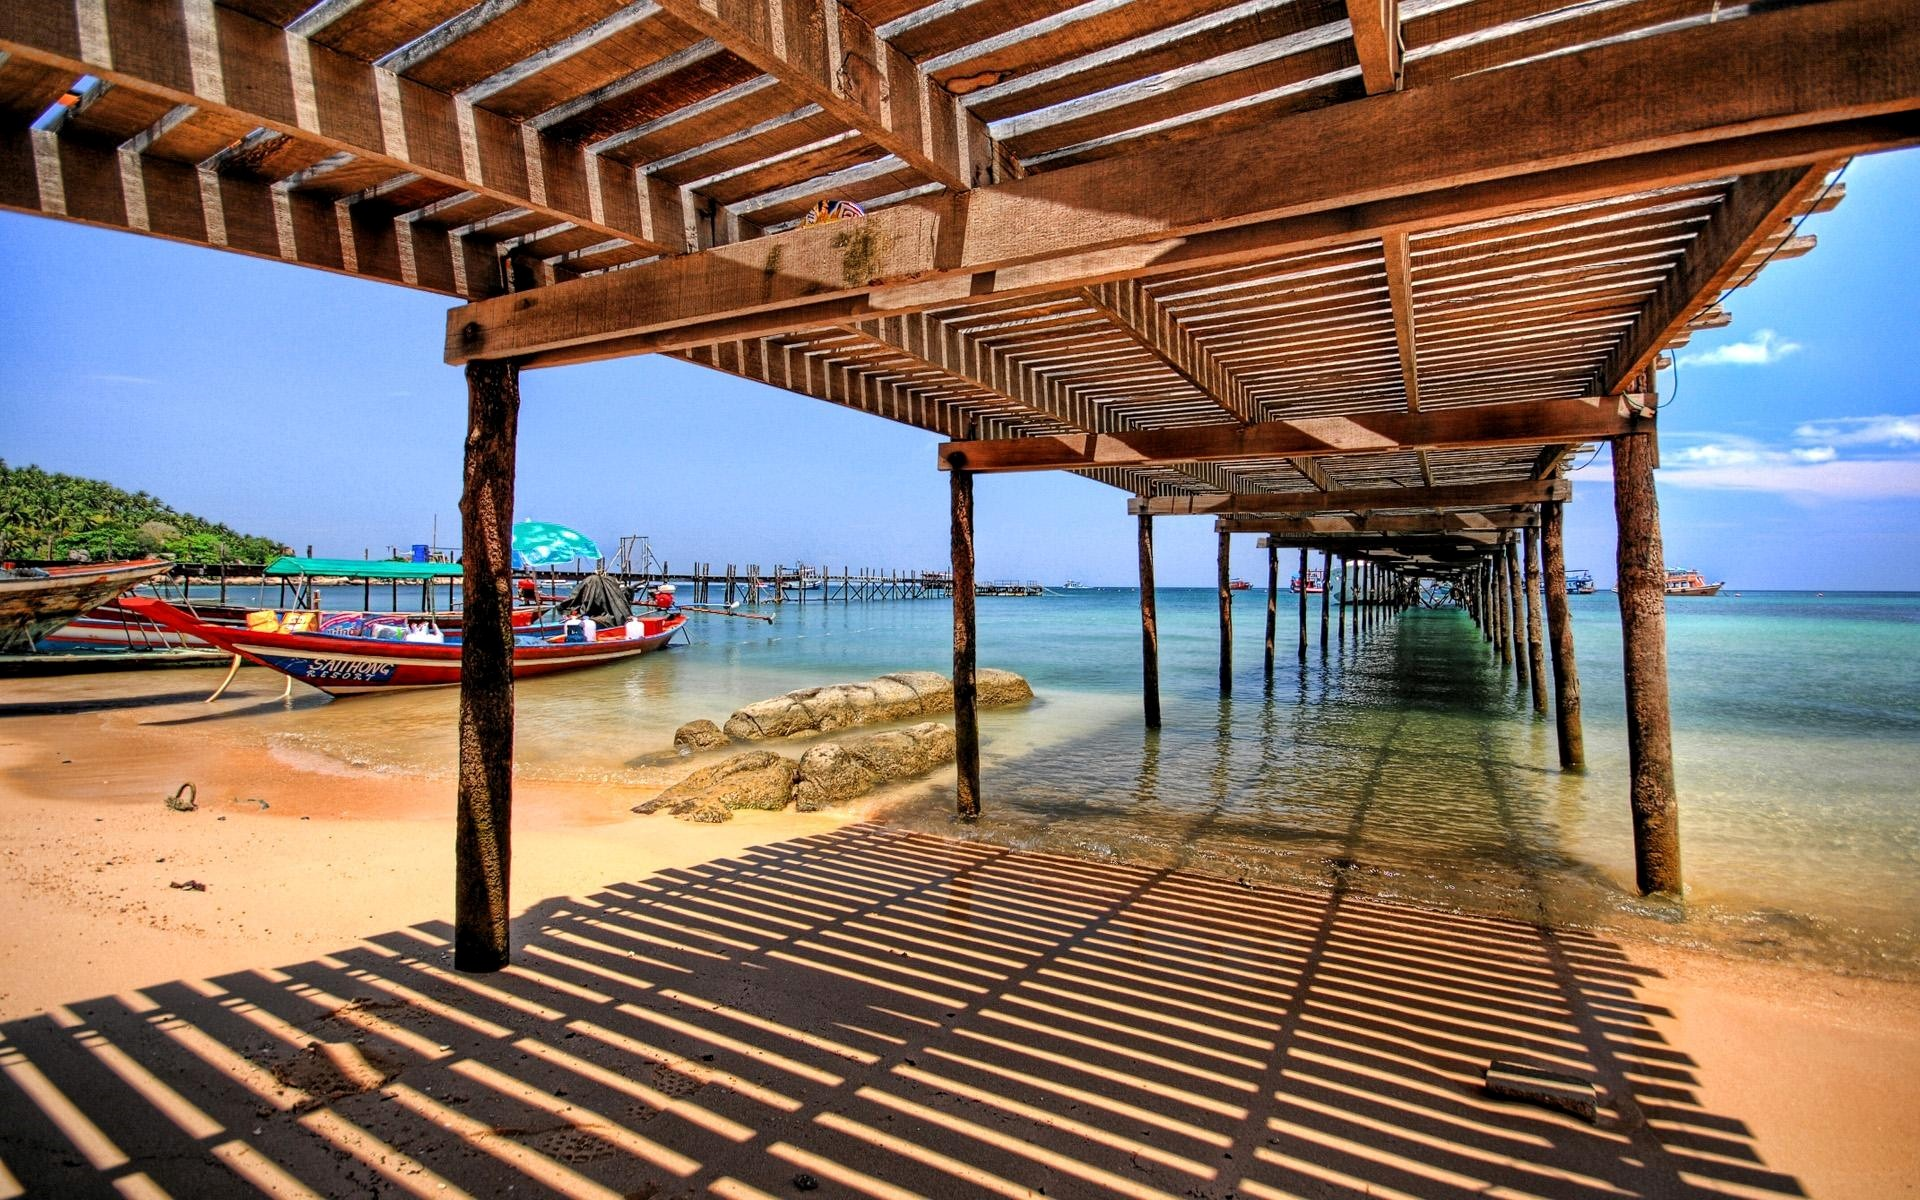 Wooden Bridge at Beach